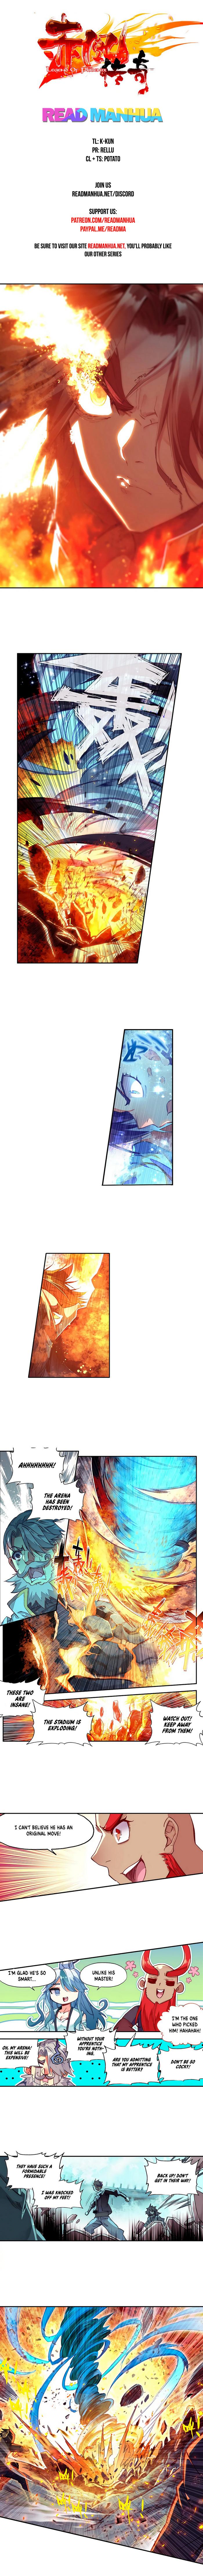 https://img2.nineanime.com/comics/pic4/22/21846/1649649/4b21cf96d4cf612f239a6c322b10c8fe.jpg Page 1